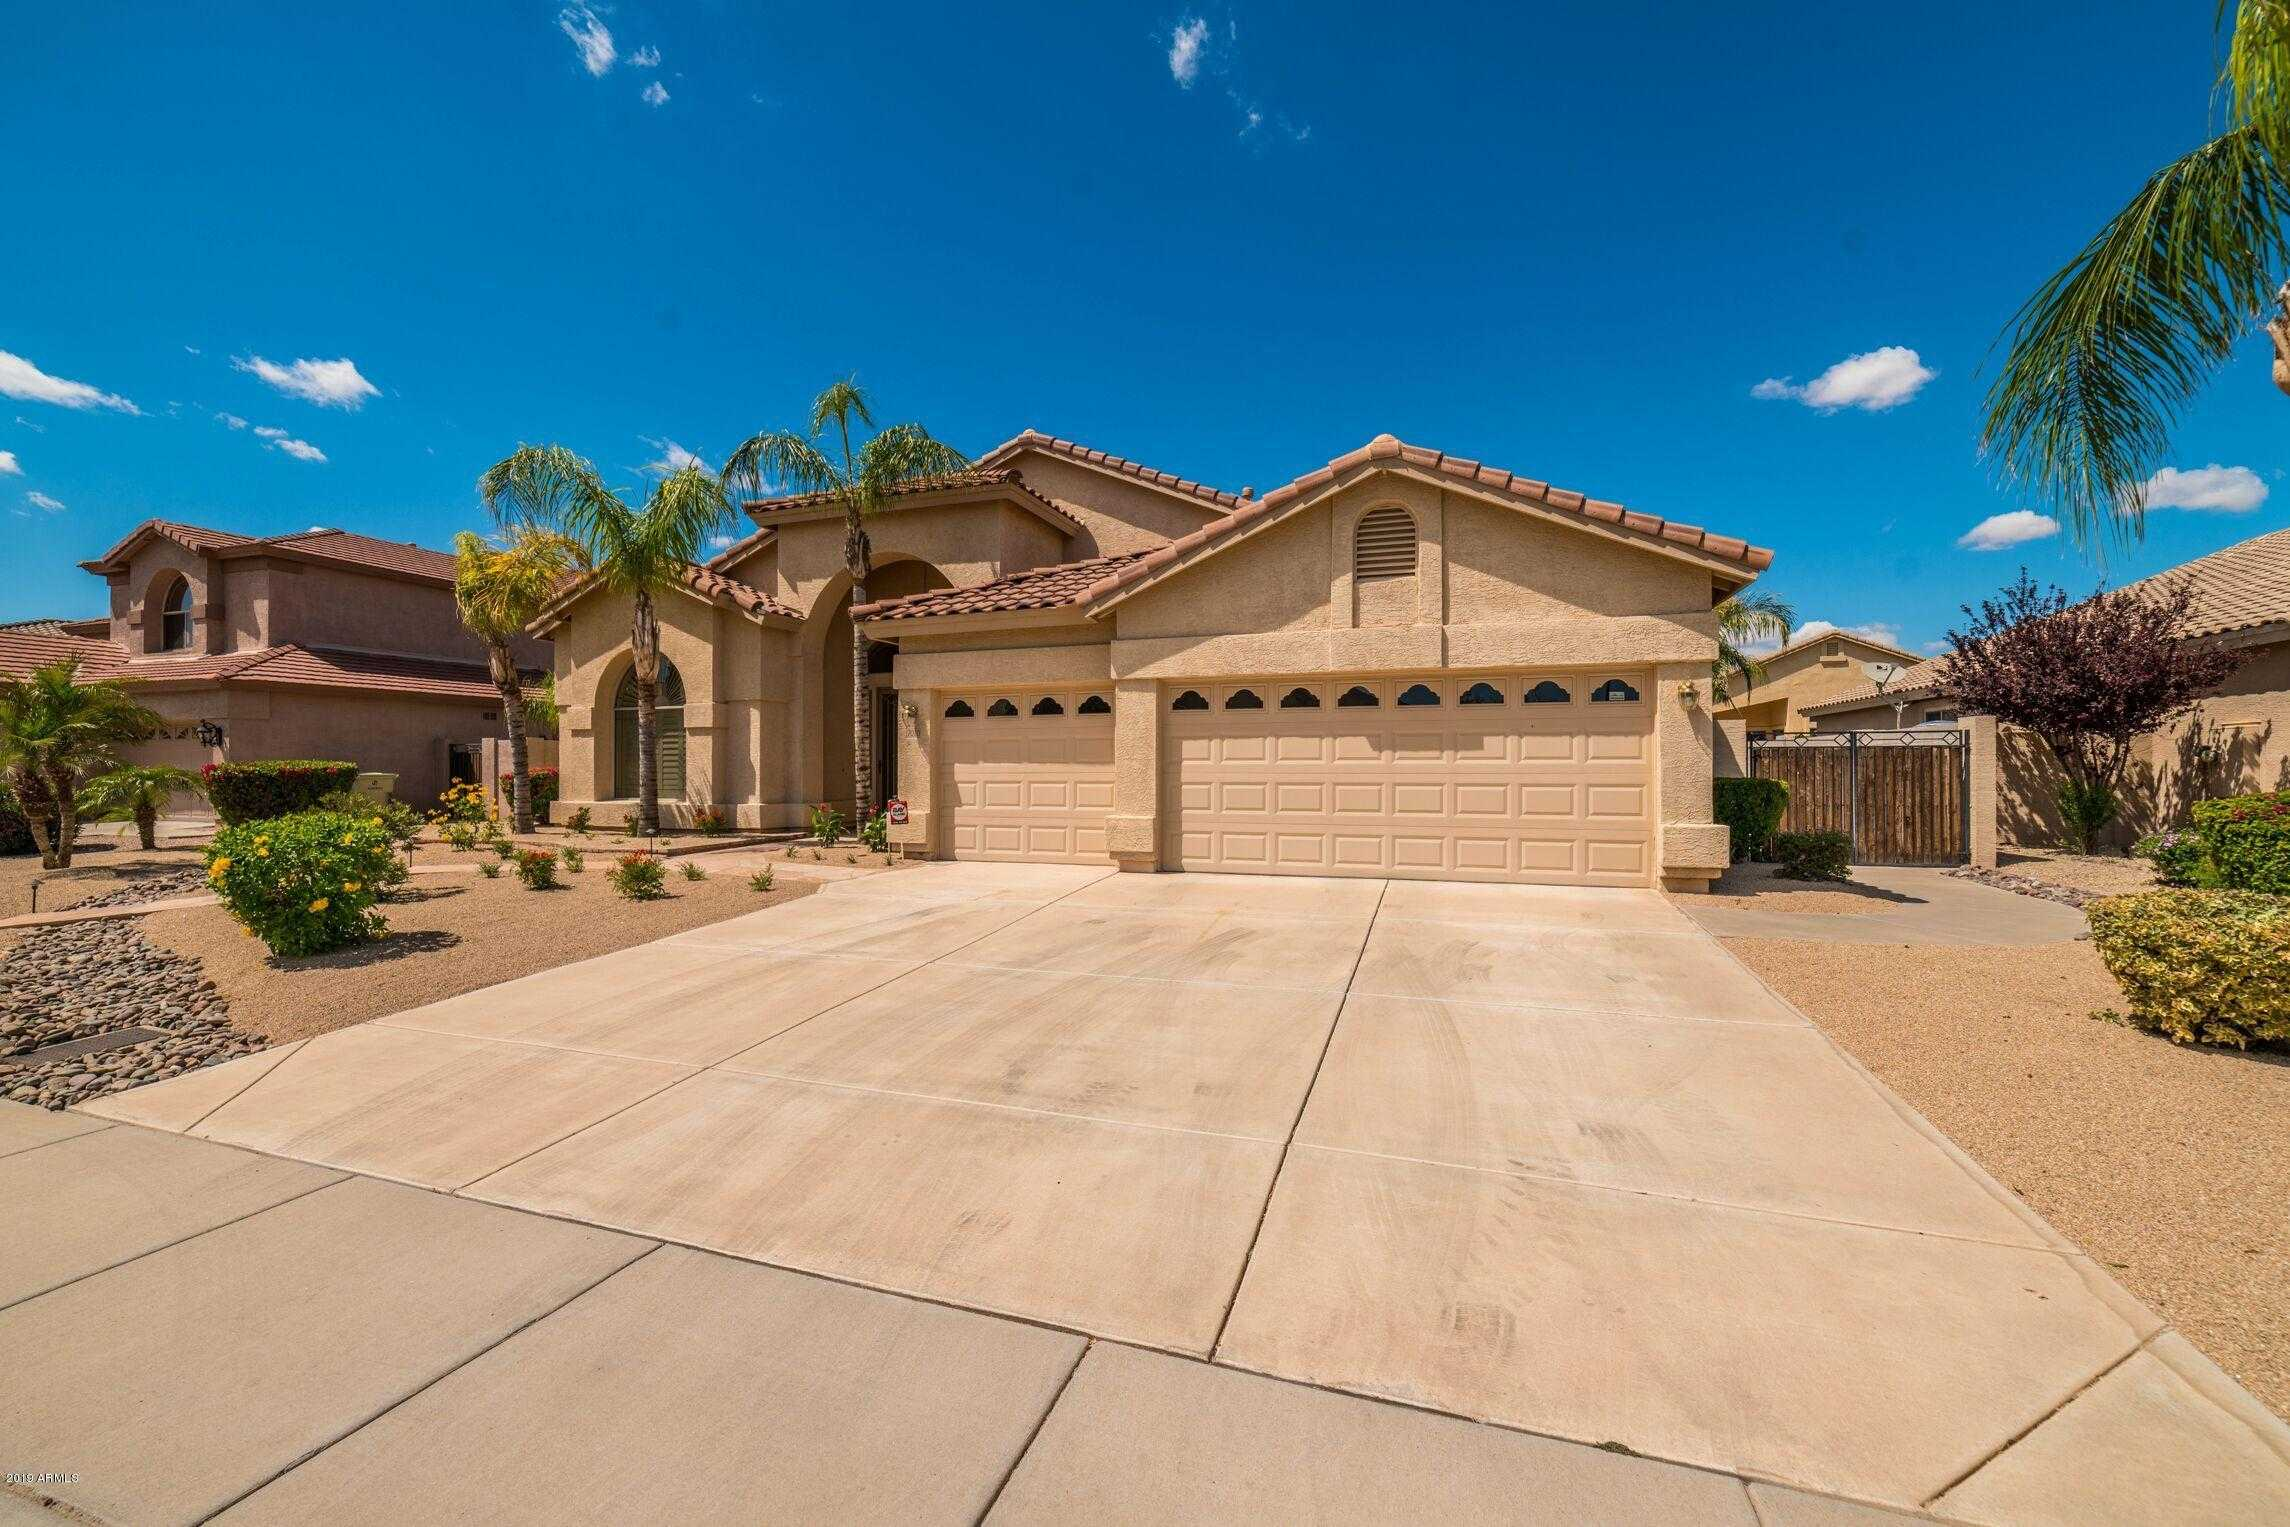 $535,000 - 4Br/3Ba - Home for Sale in Sierra Verde Parcel C, Glendale